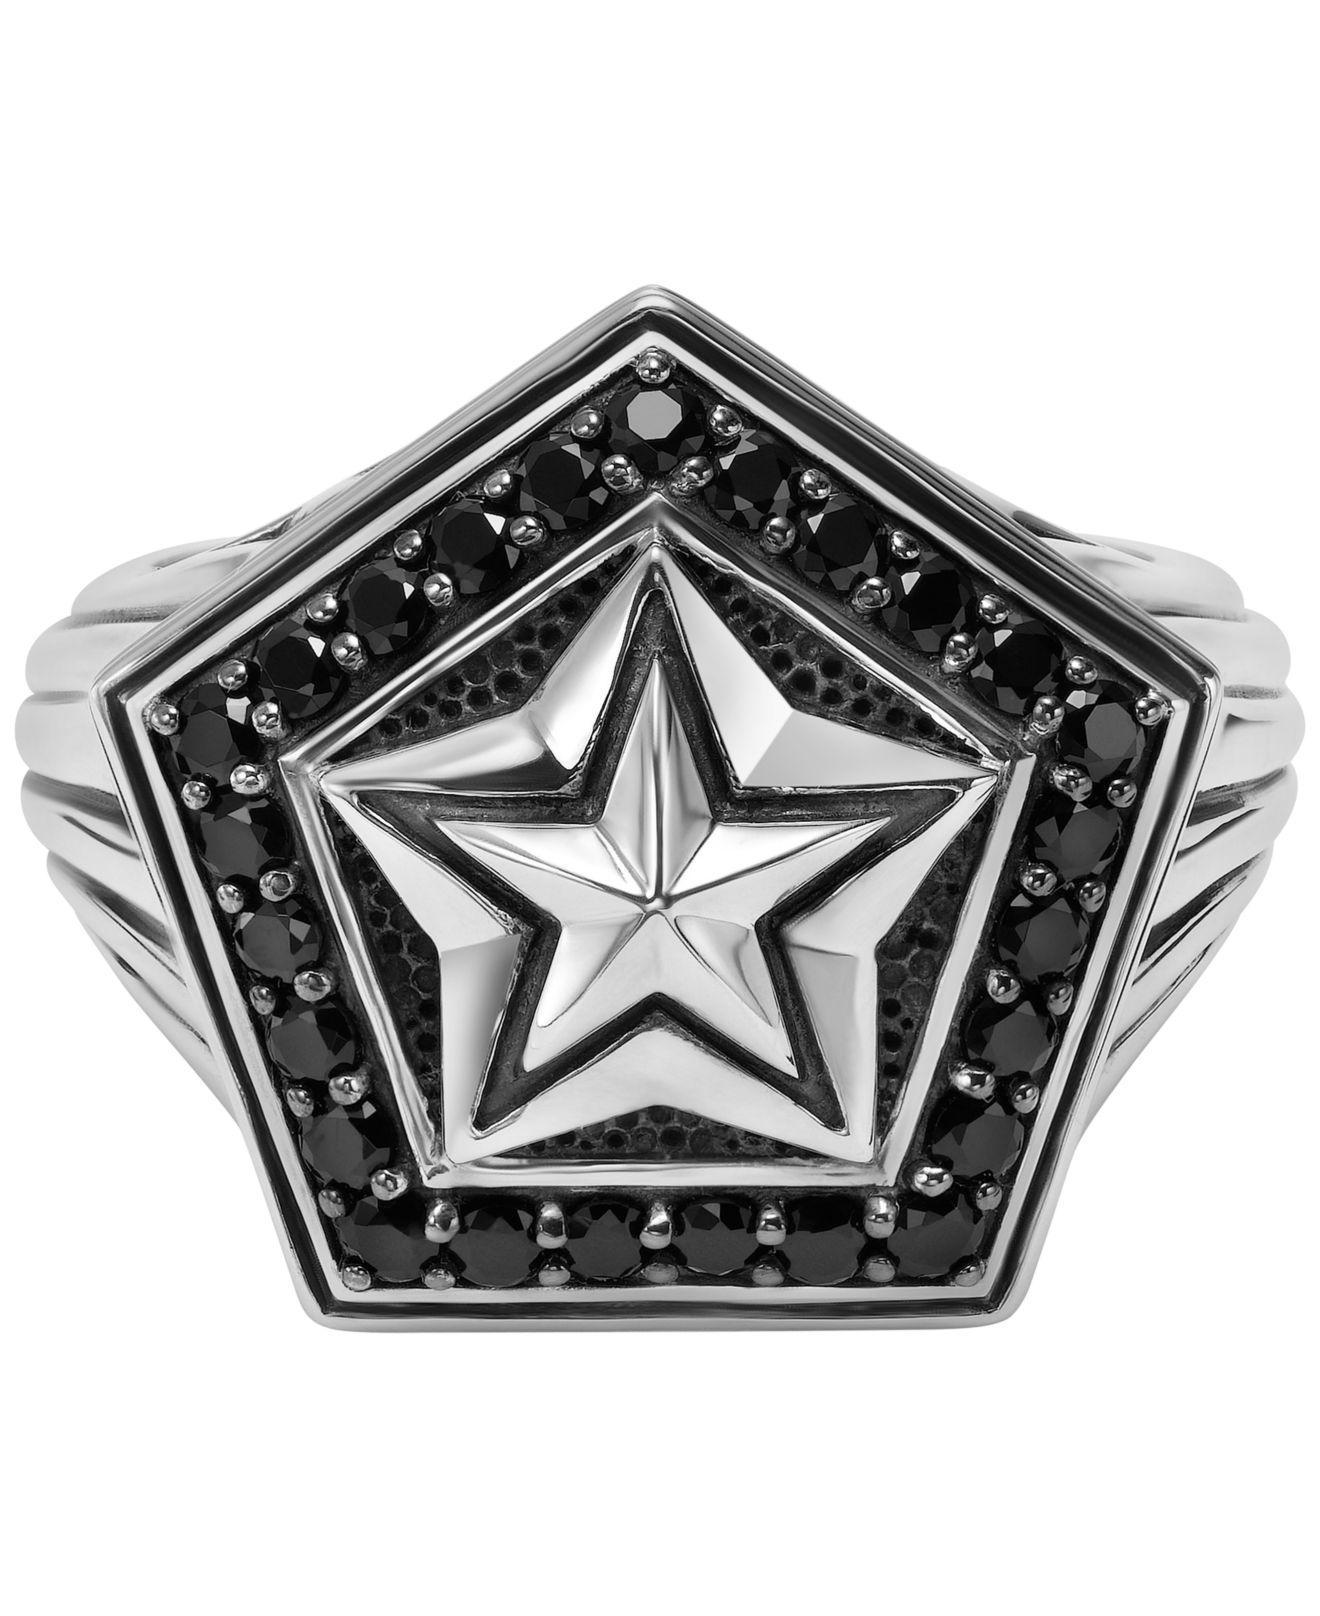 ae178faa2 Scott Kay - Metallic Men's Black Sapphire Star Ring (1-1/4 Ct. View  fullscreen